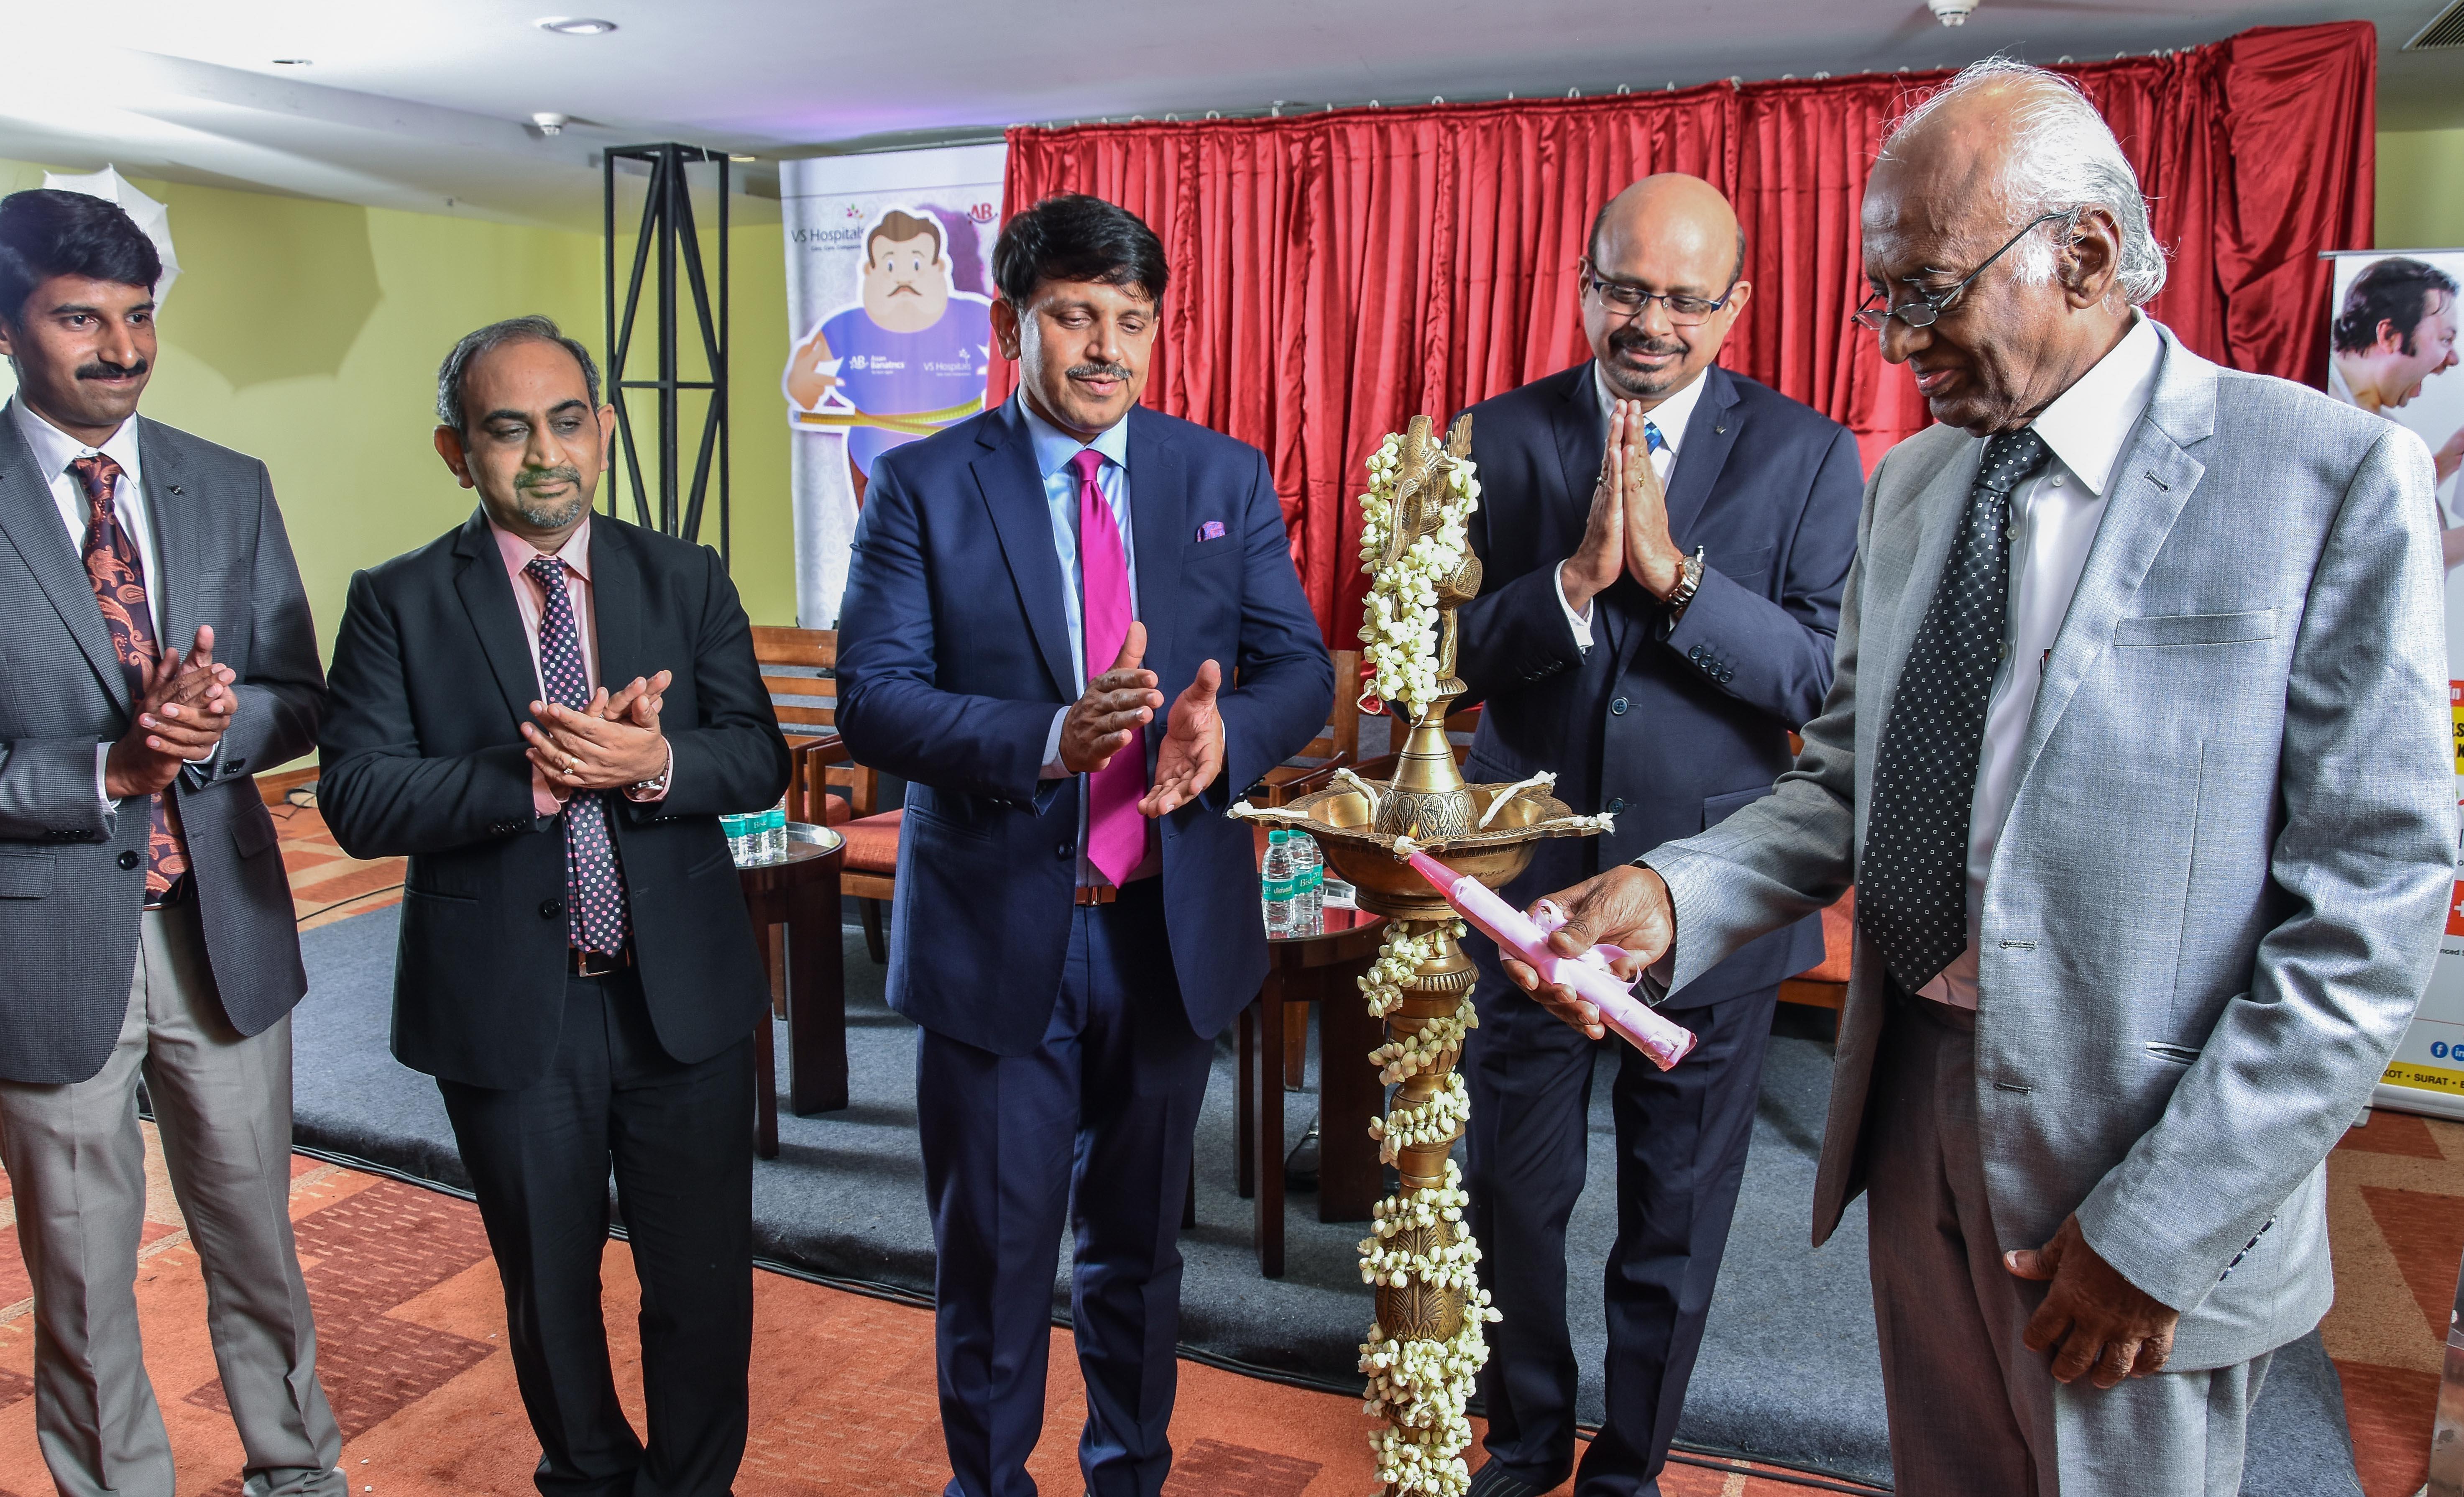 VS Hospitals and Asian Bariatrics to establish Center for Bariatric n Metabolic Surgeries